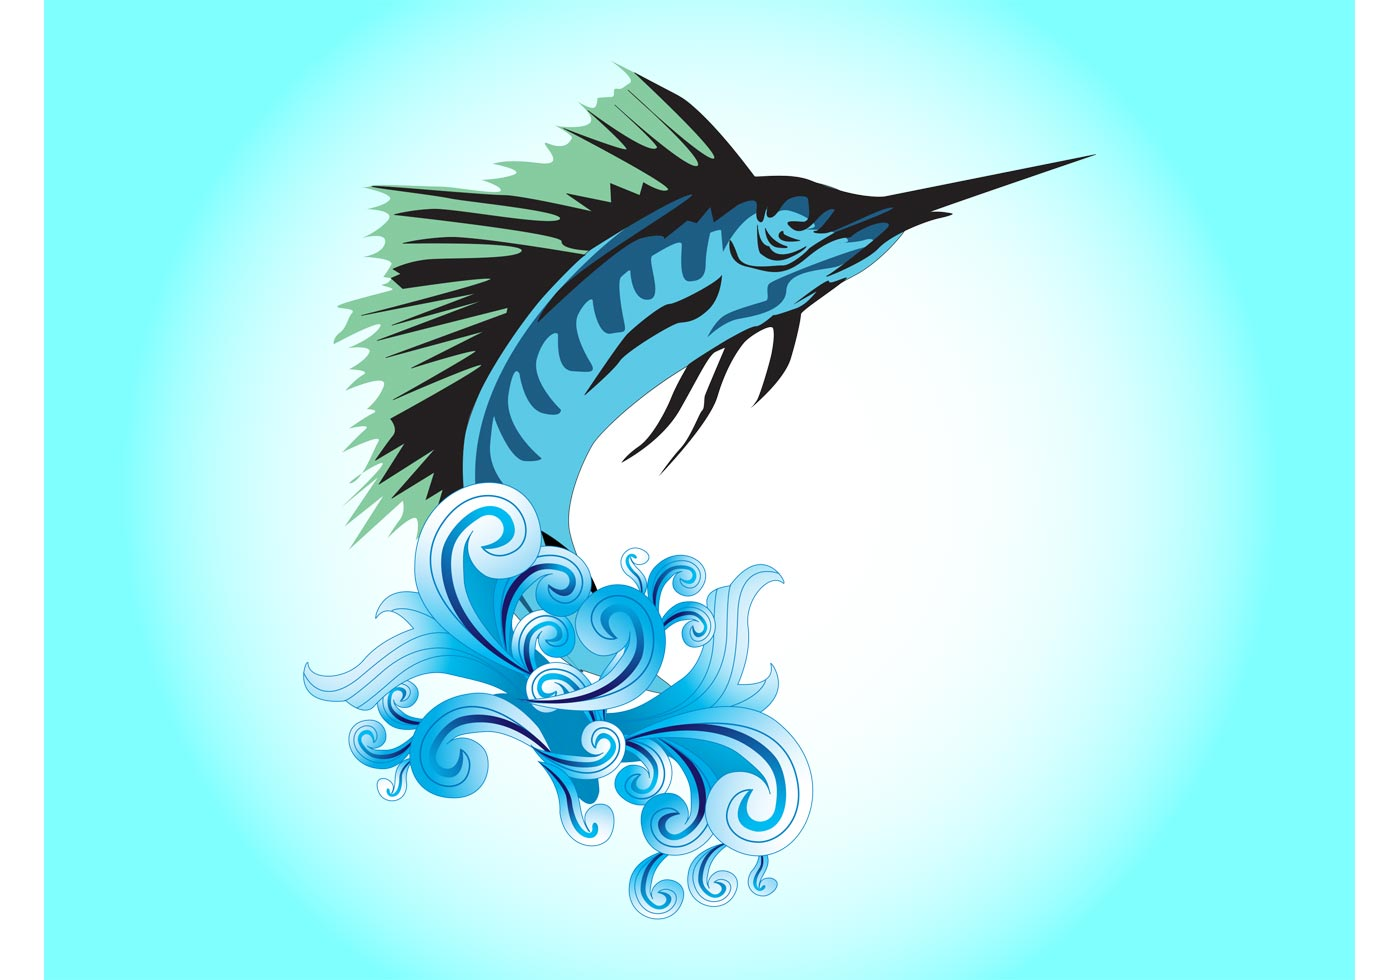 1400x980 Jumping Fish Free Vector Art